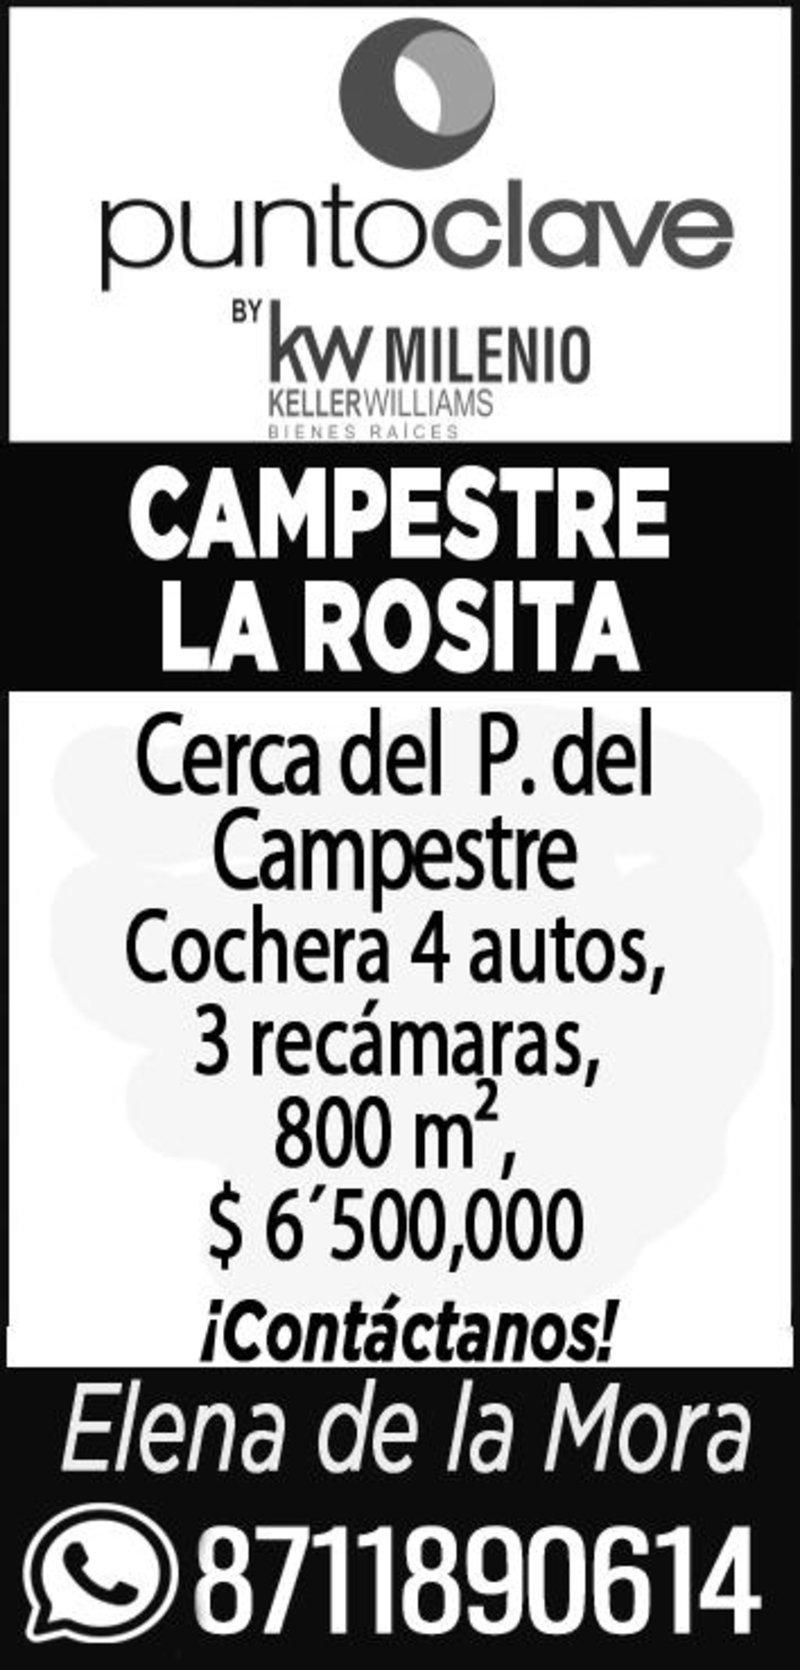 CAMPESTRE LA ROSITA